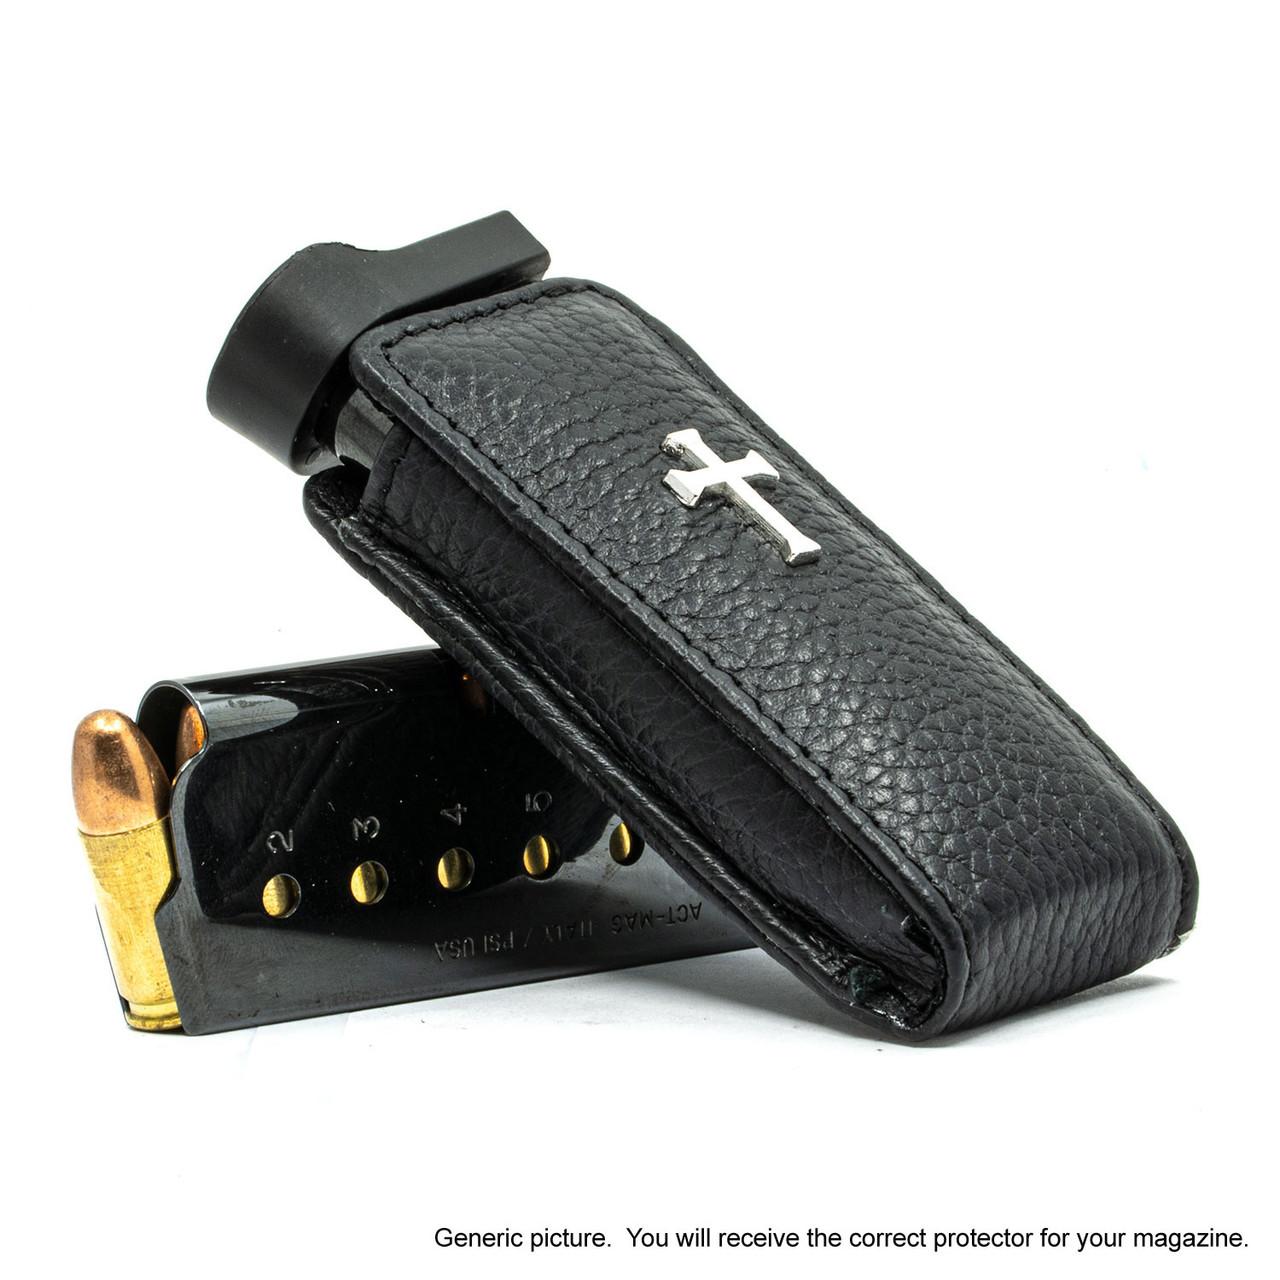 Kahr PM9 Black Leather Cross Magazine Pocket Protector